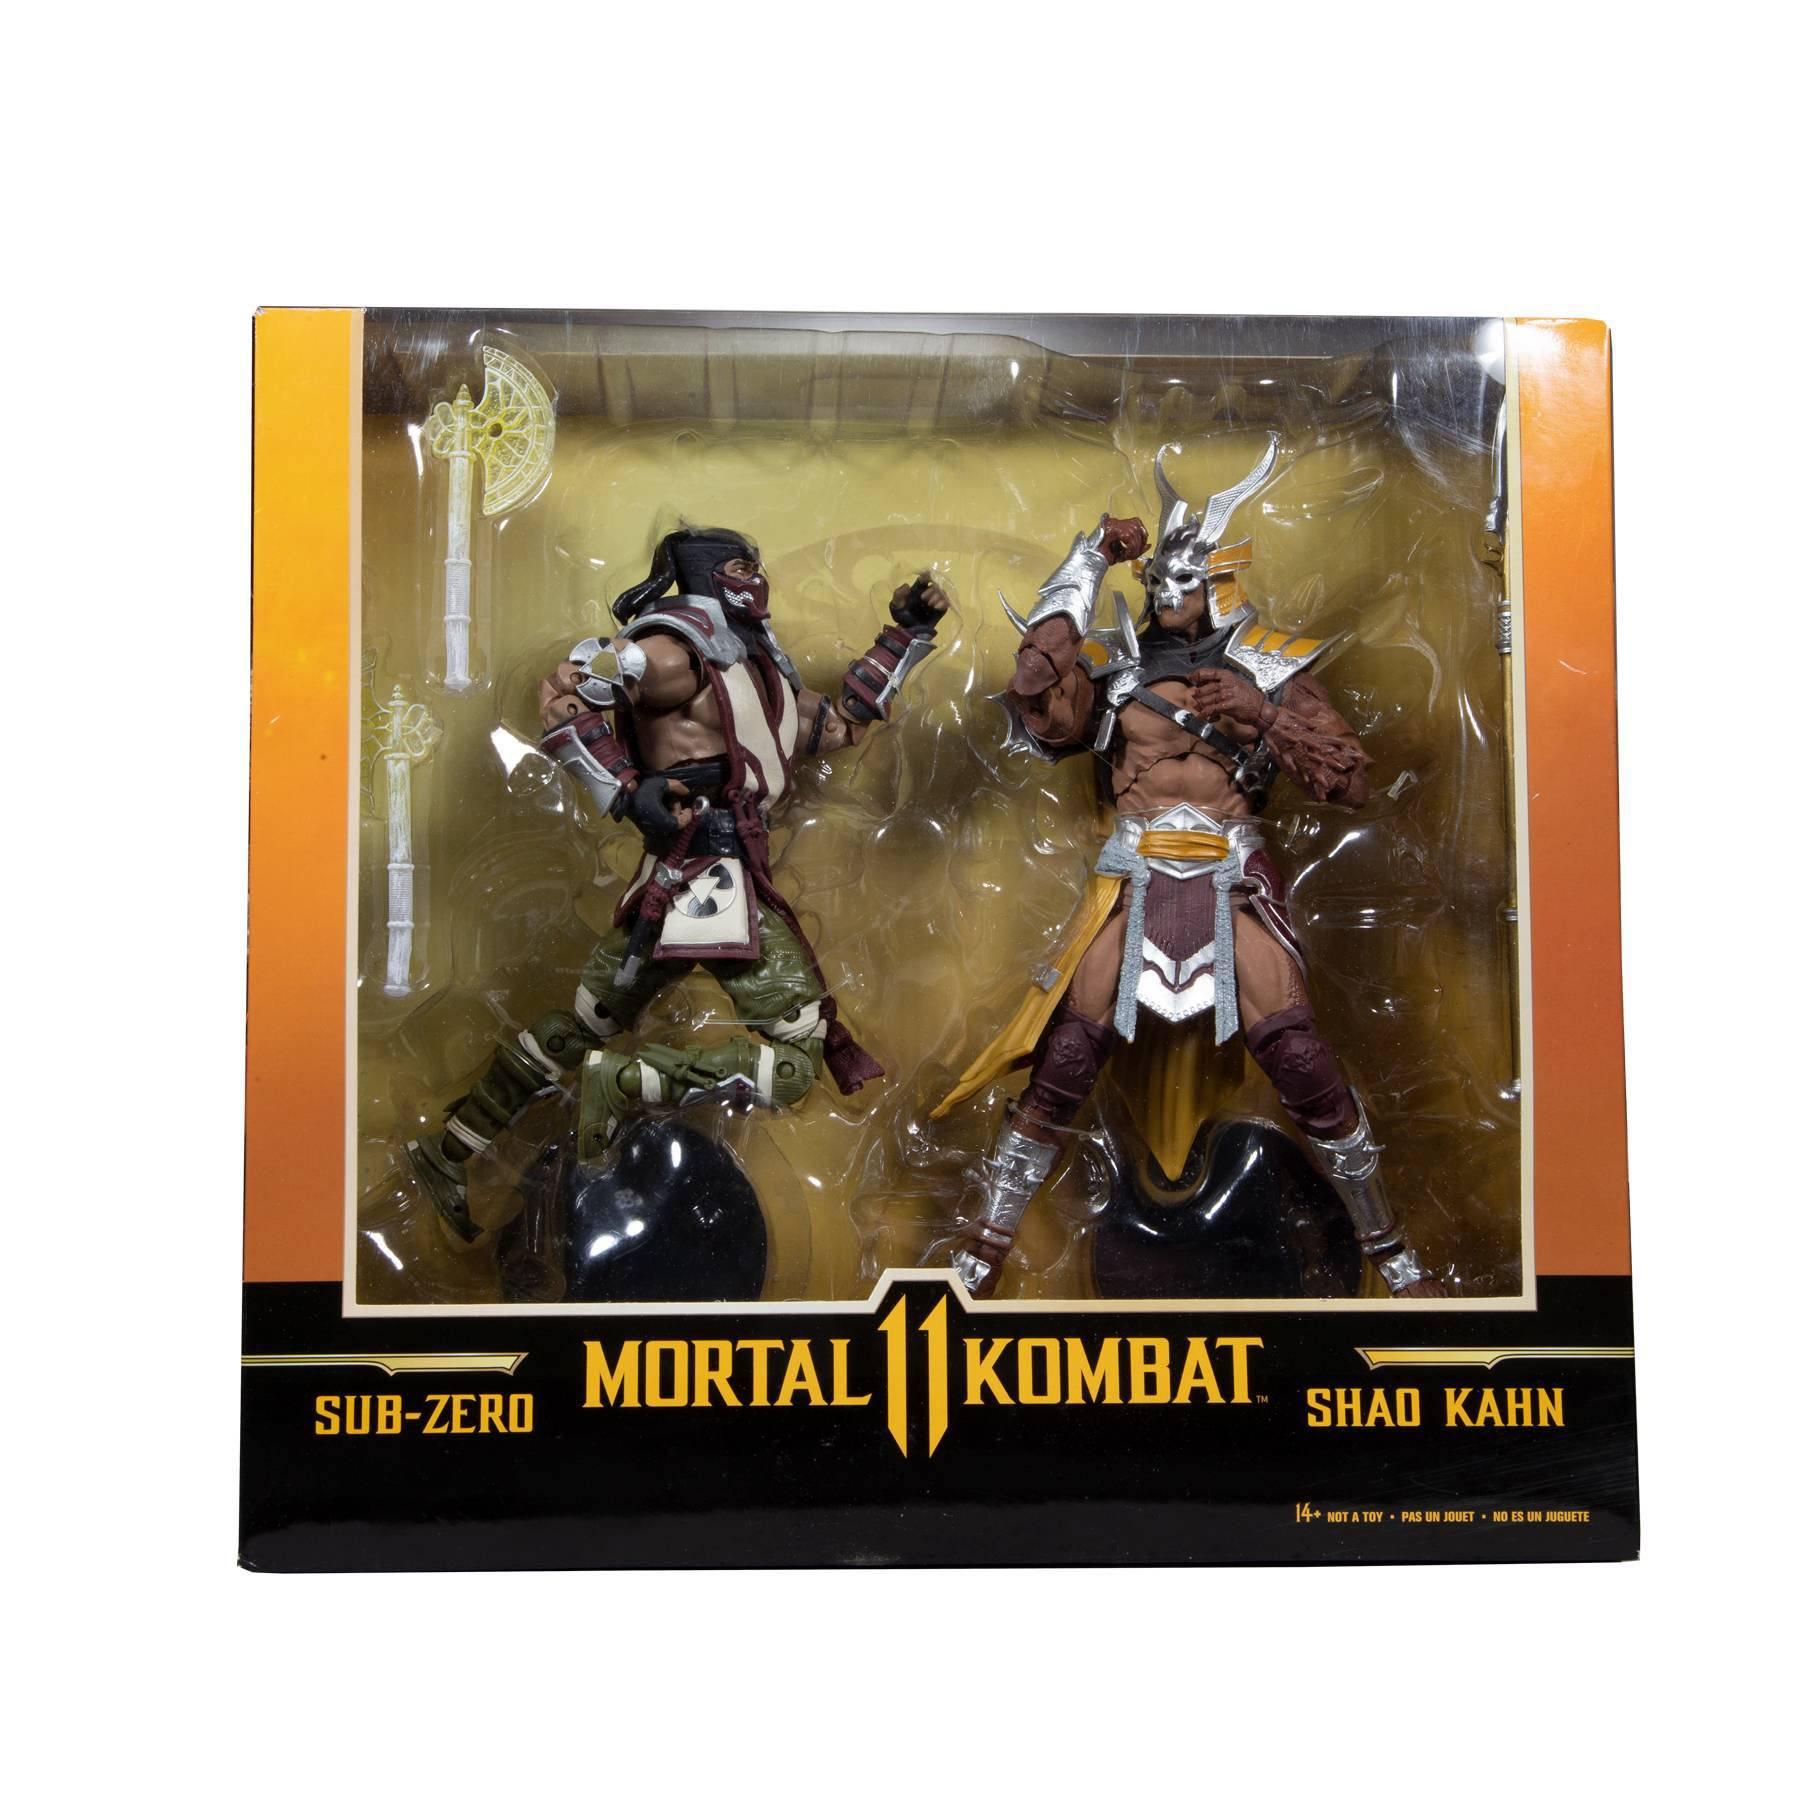 Mortal Kombat Actionfiguren Doppelpack Sub-Zero & Shao Khan 18 cm MCF11054 787926110548